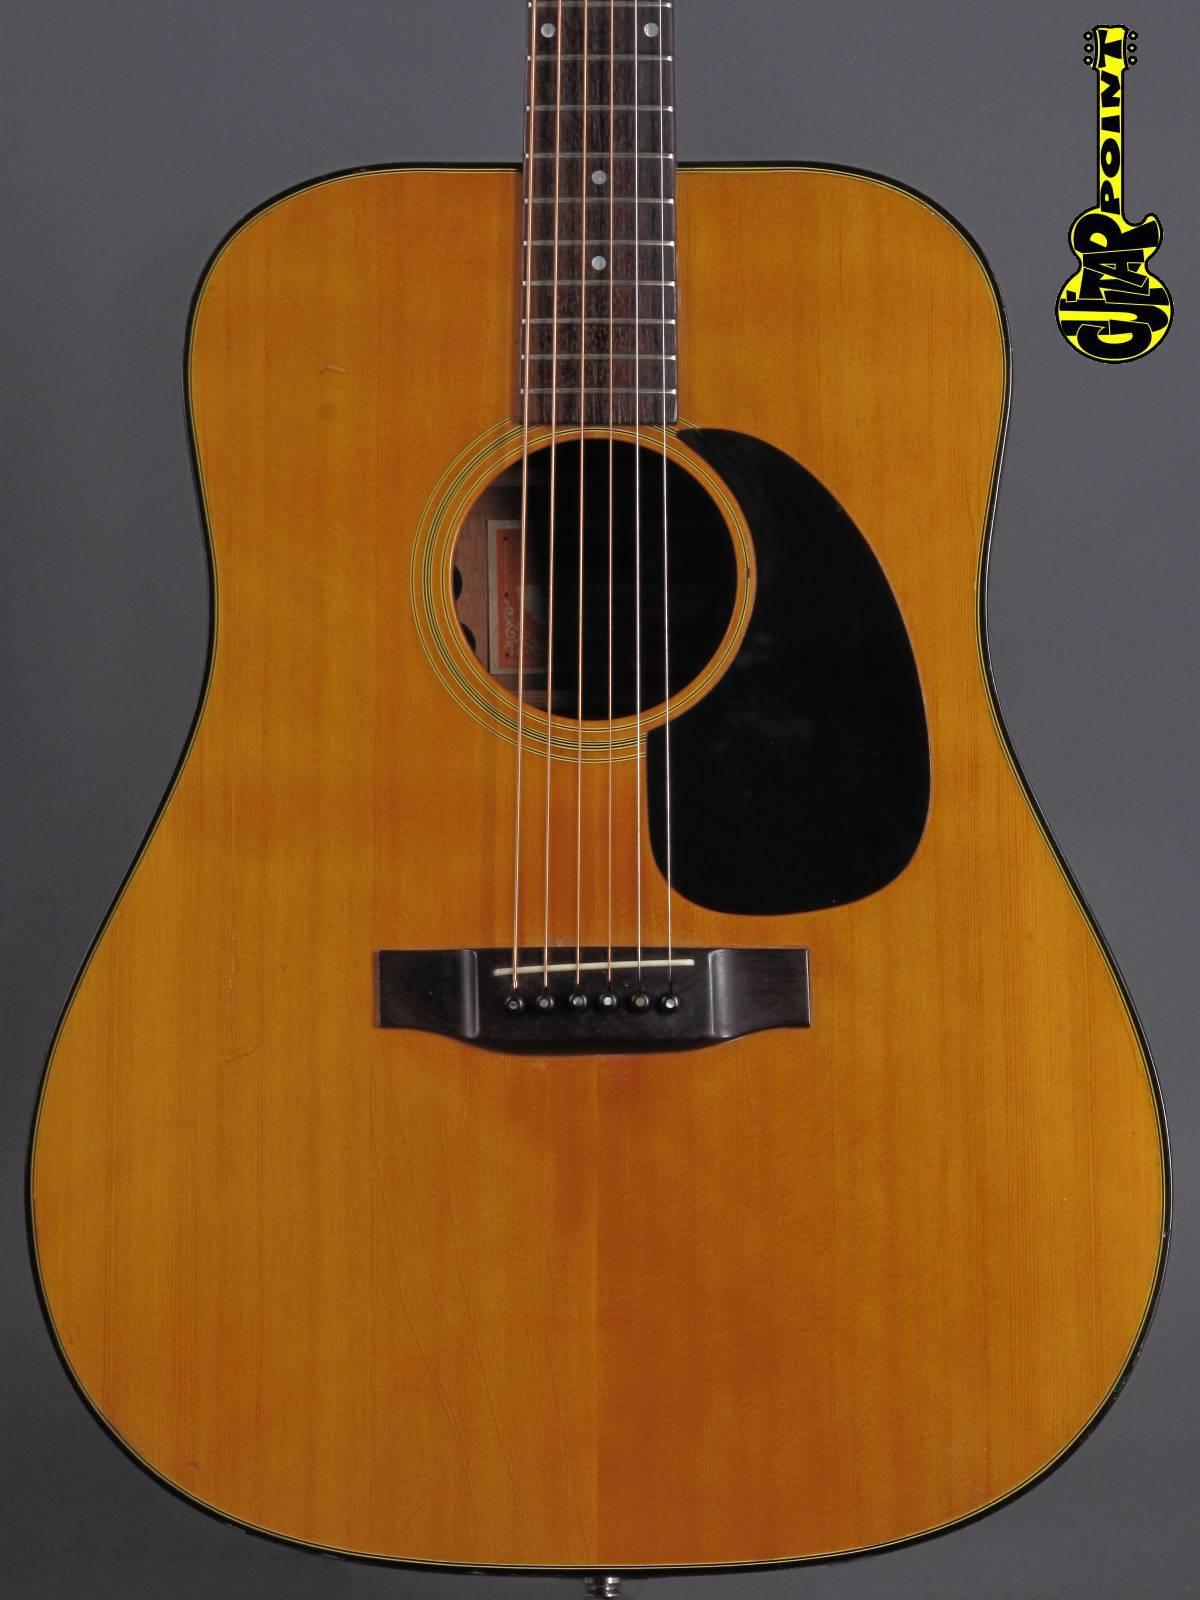 1972 Gibson J-50 - Natural (incl. Fishman PU)